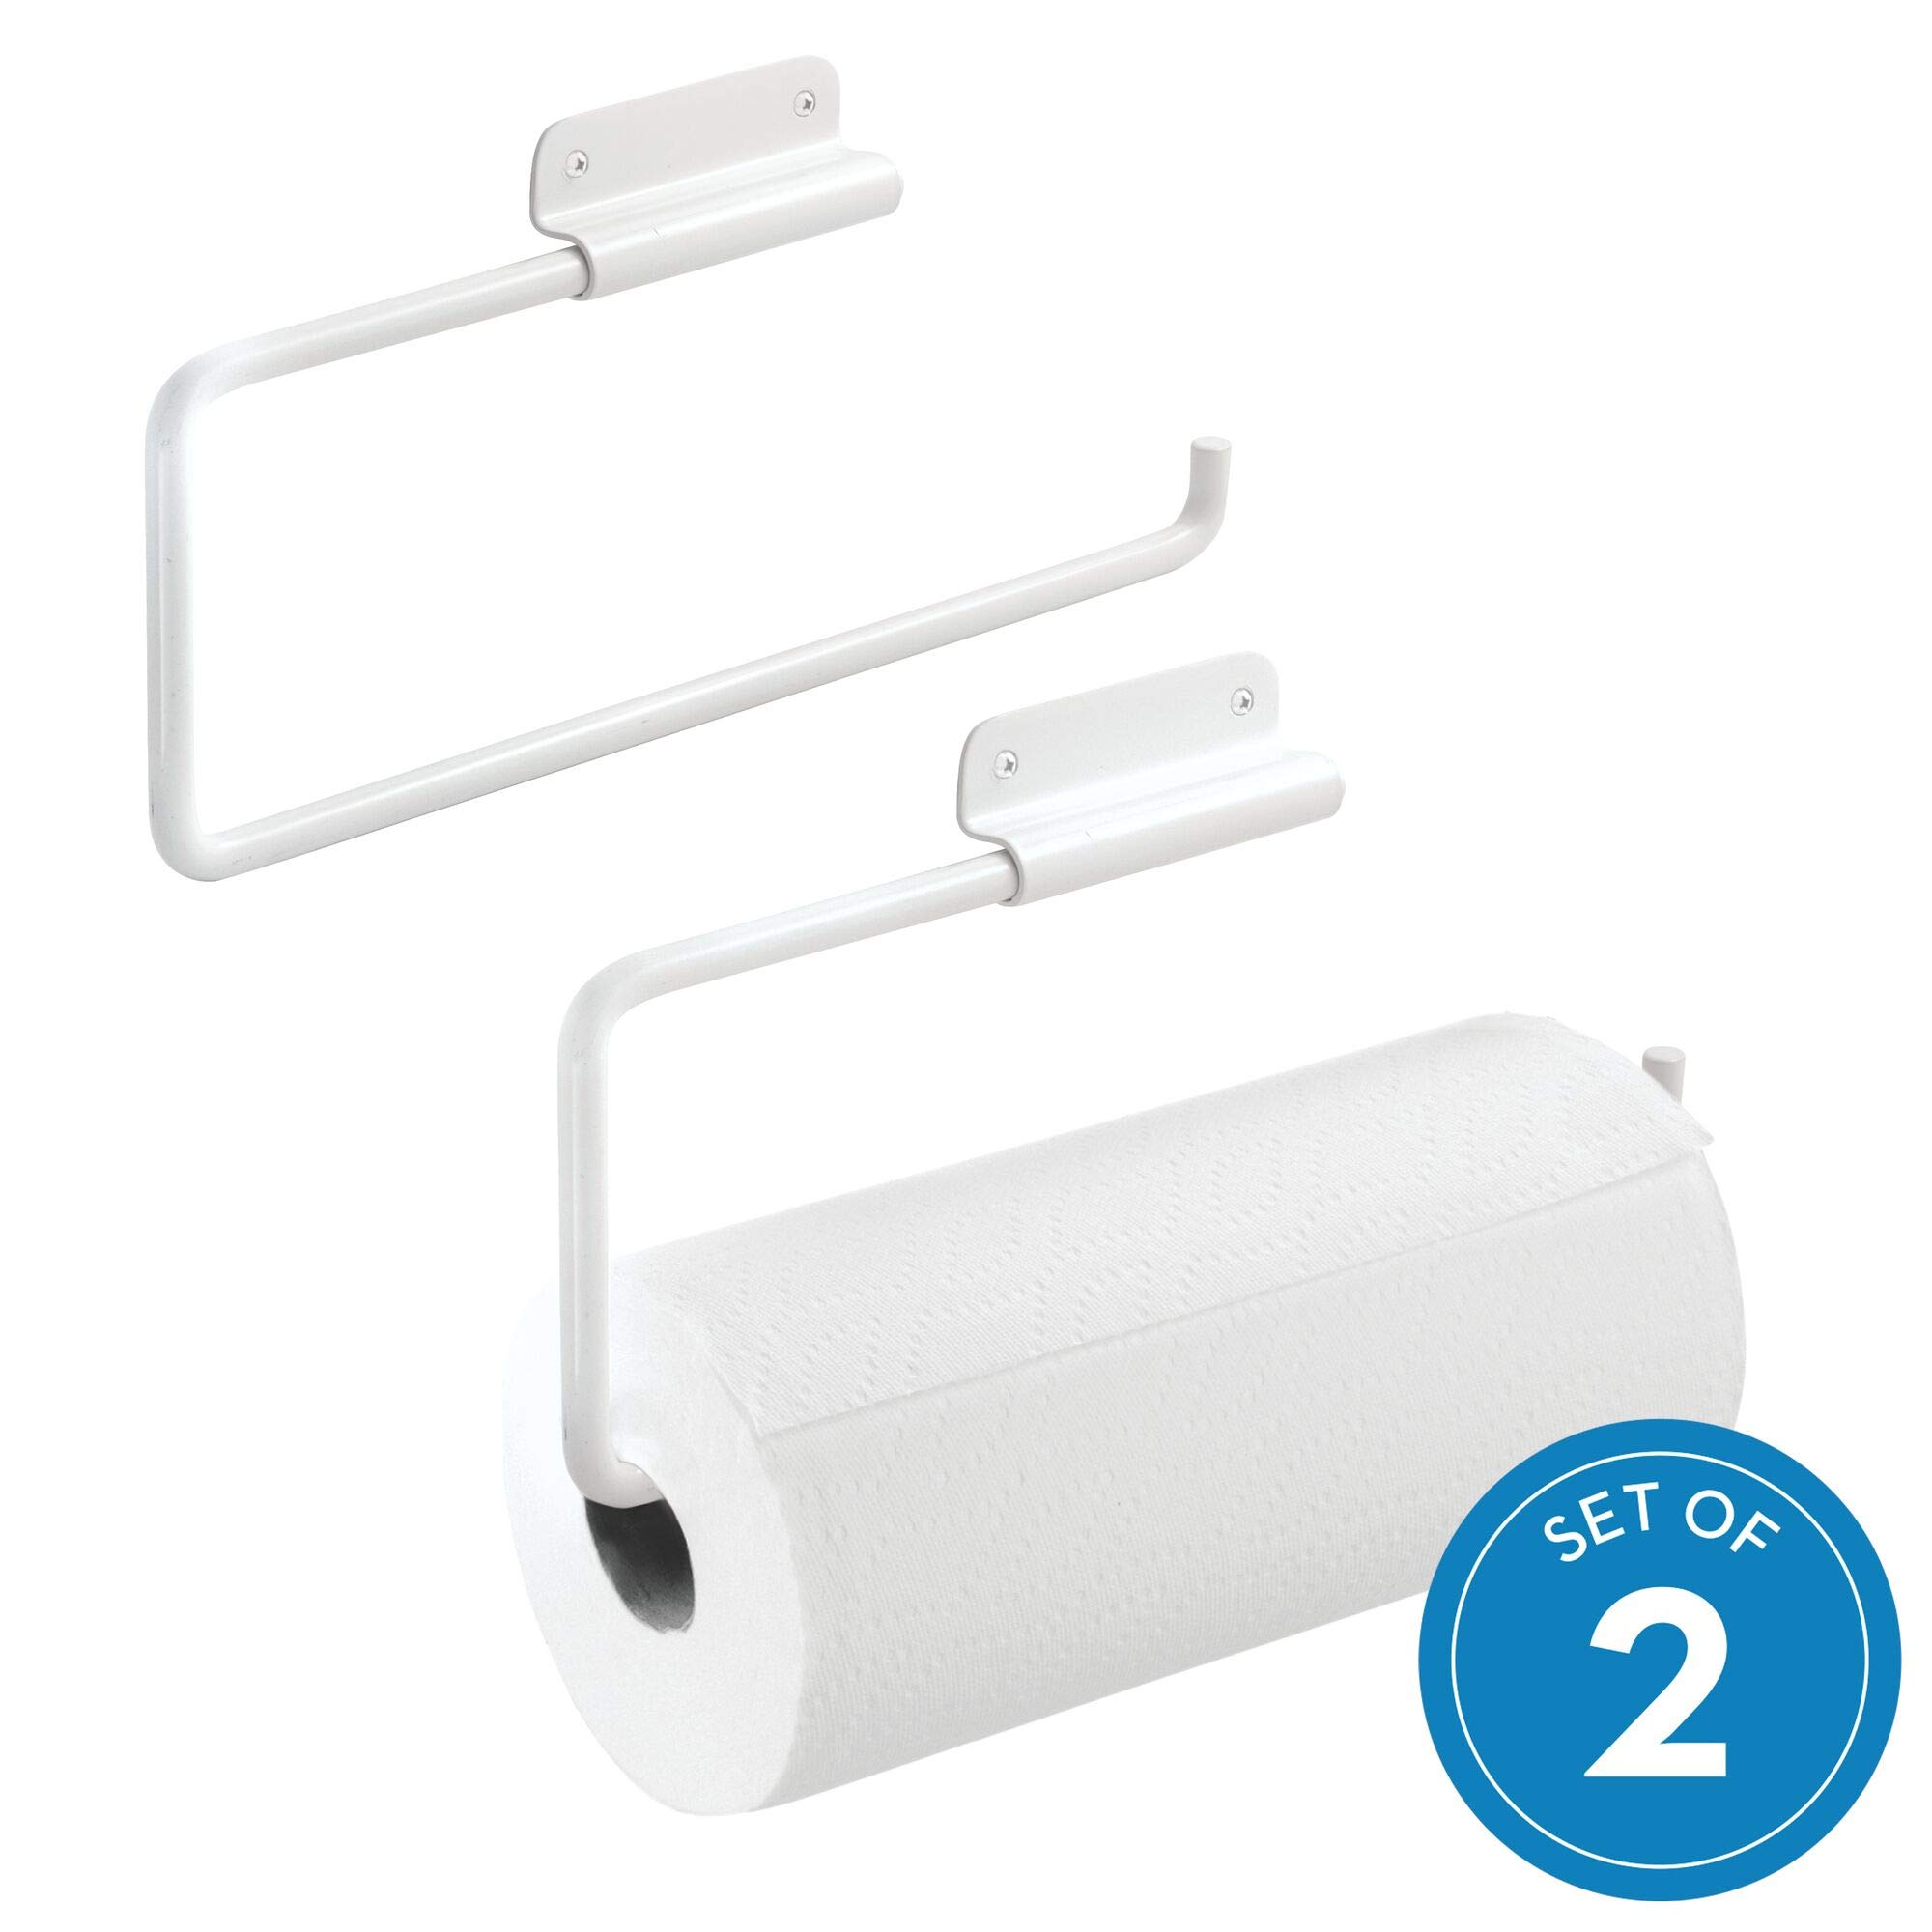 iDesign Swivel Wall Mount Paper Towel Holder, Paper Towel Dispenser for Kitchen or Bathroom - White, Pack of 2